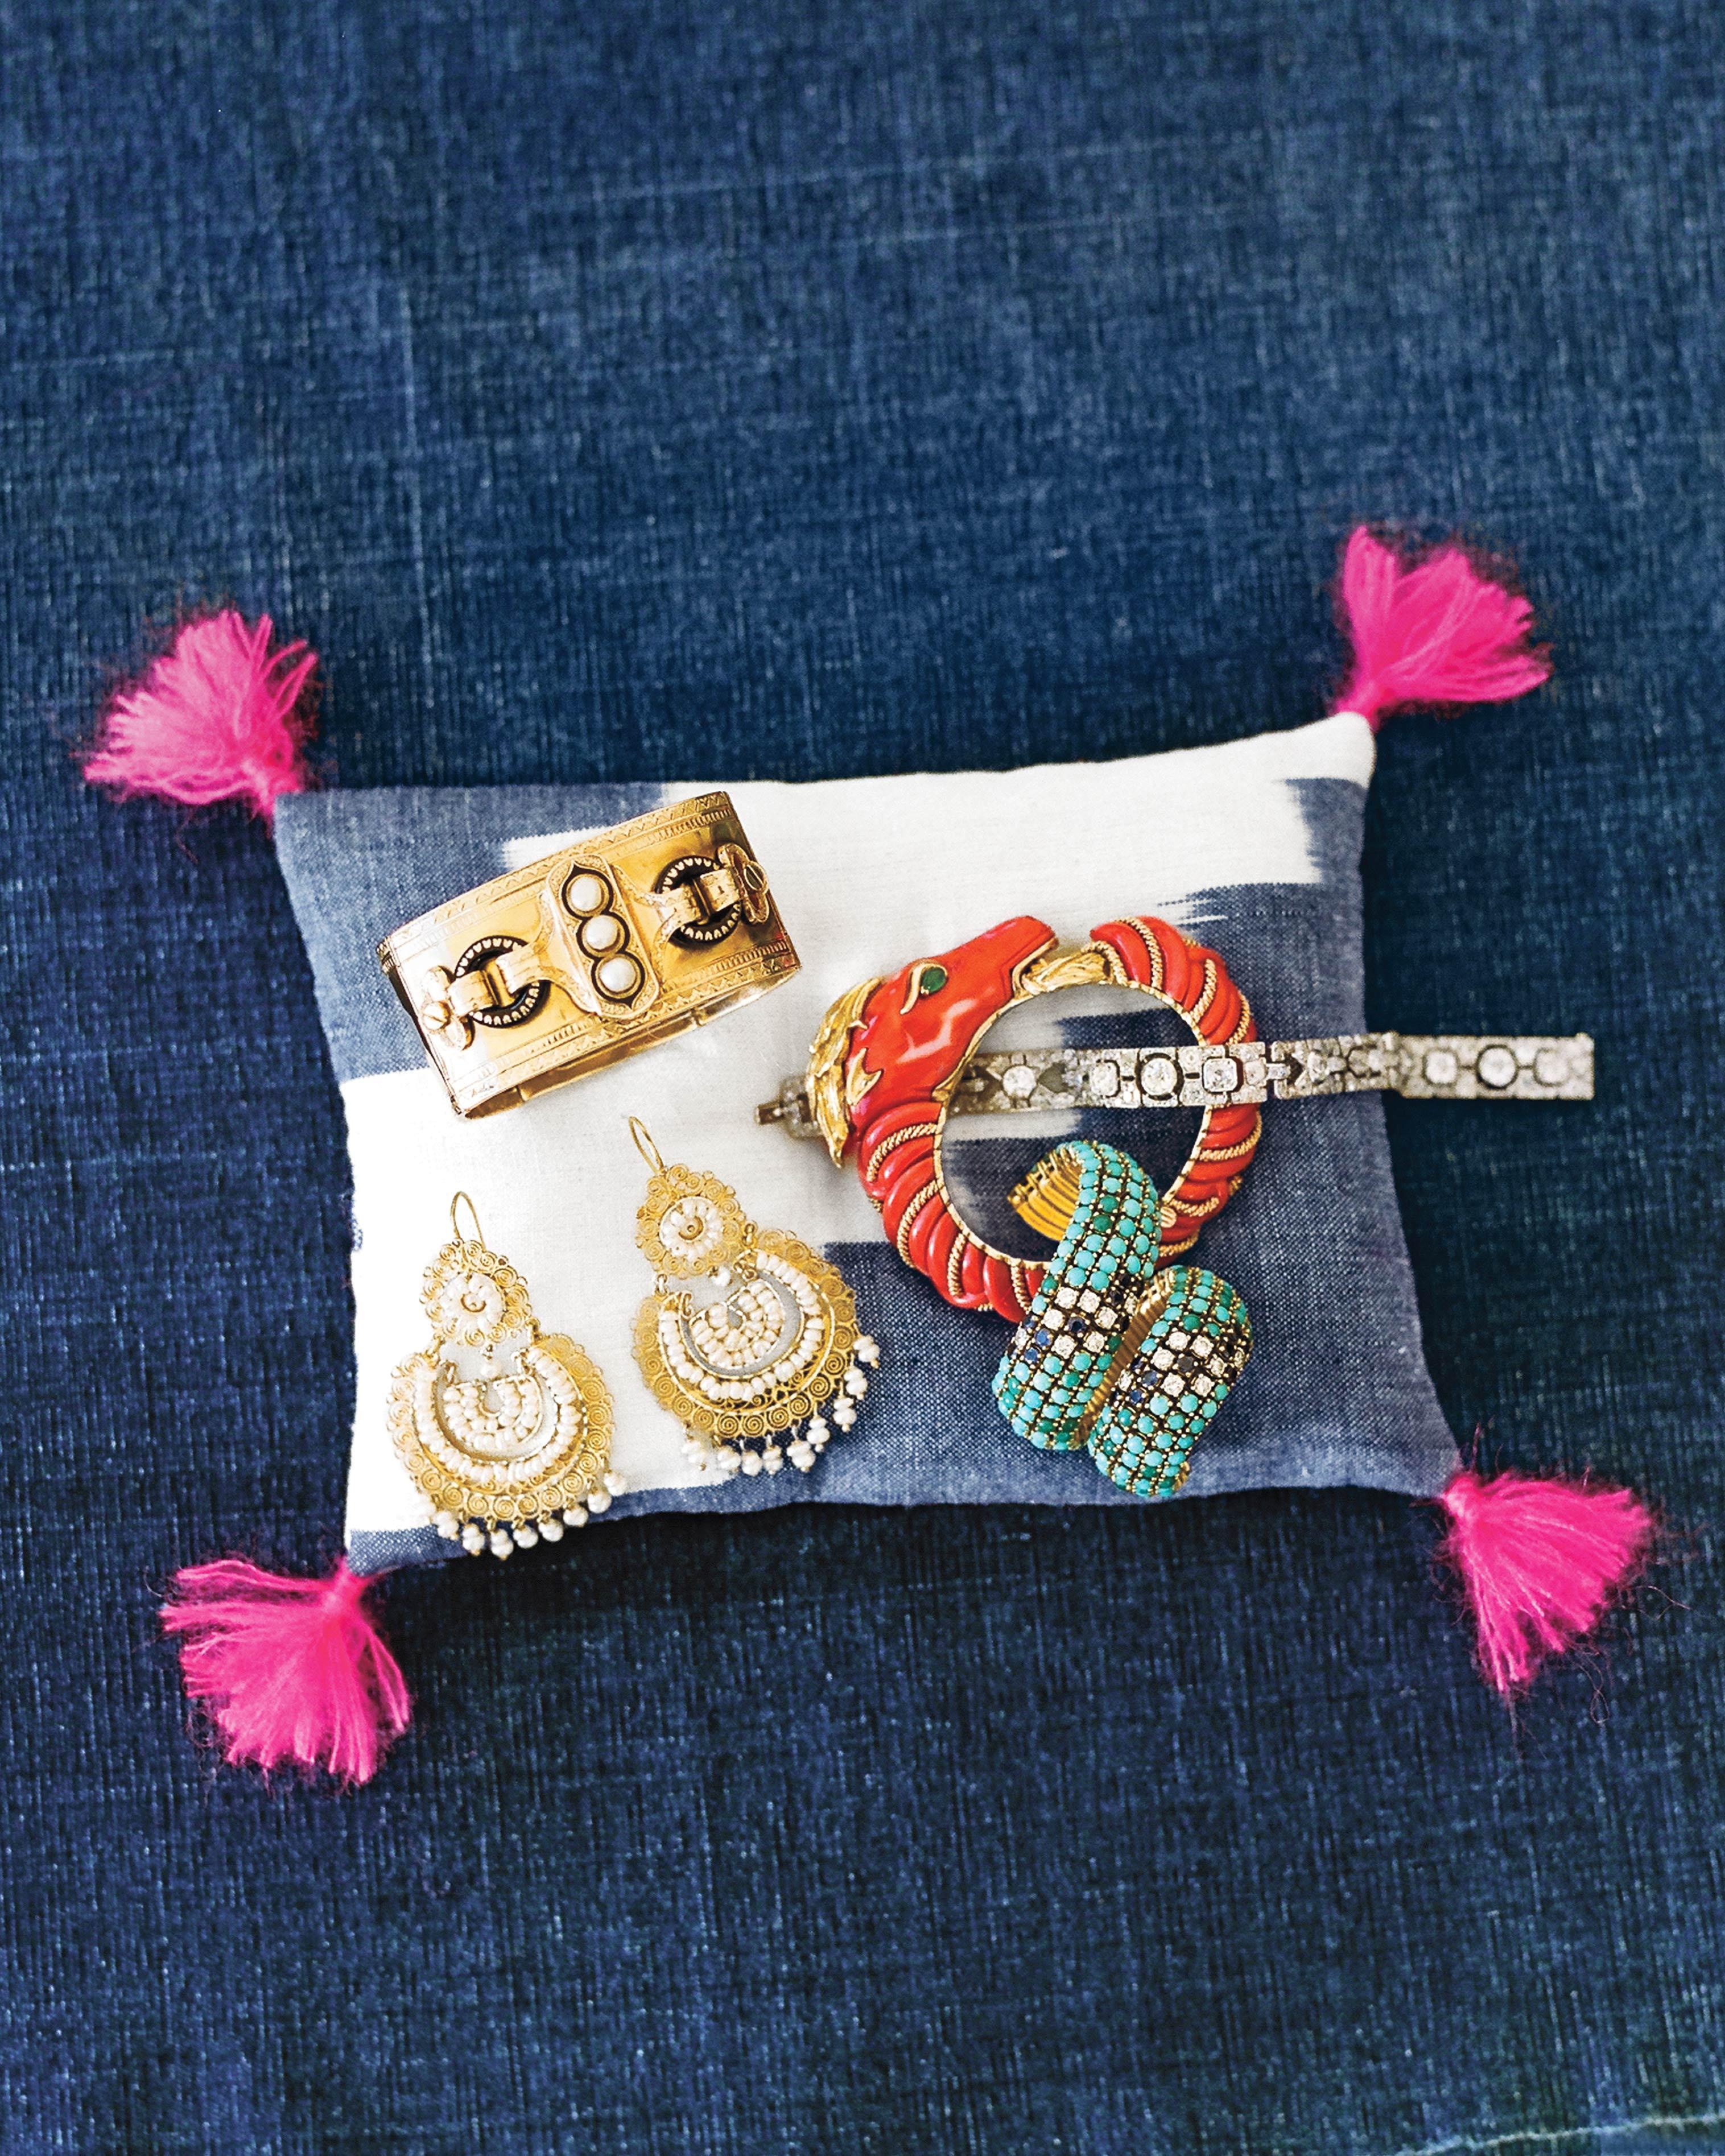 mfiona-peter-wedding-vermont-brides-jewelry-9629.01.2015.47-d112512.jpg